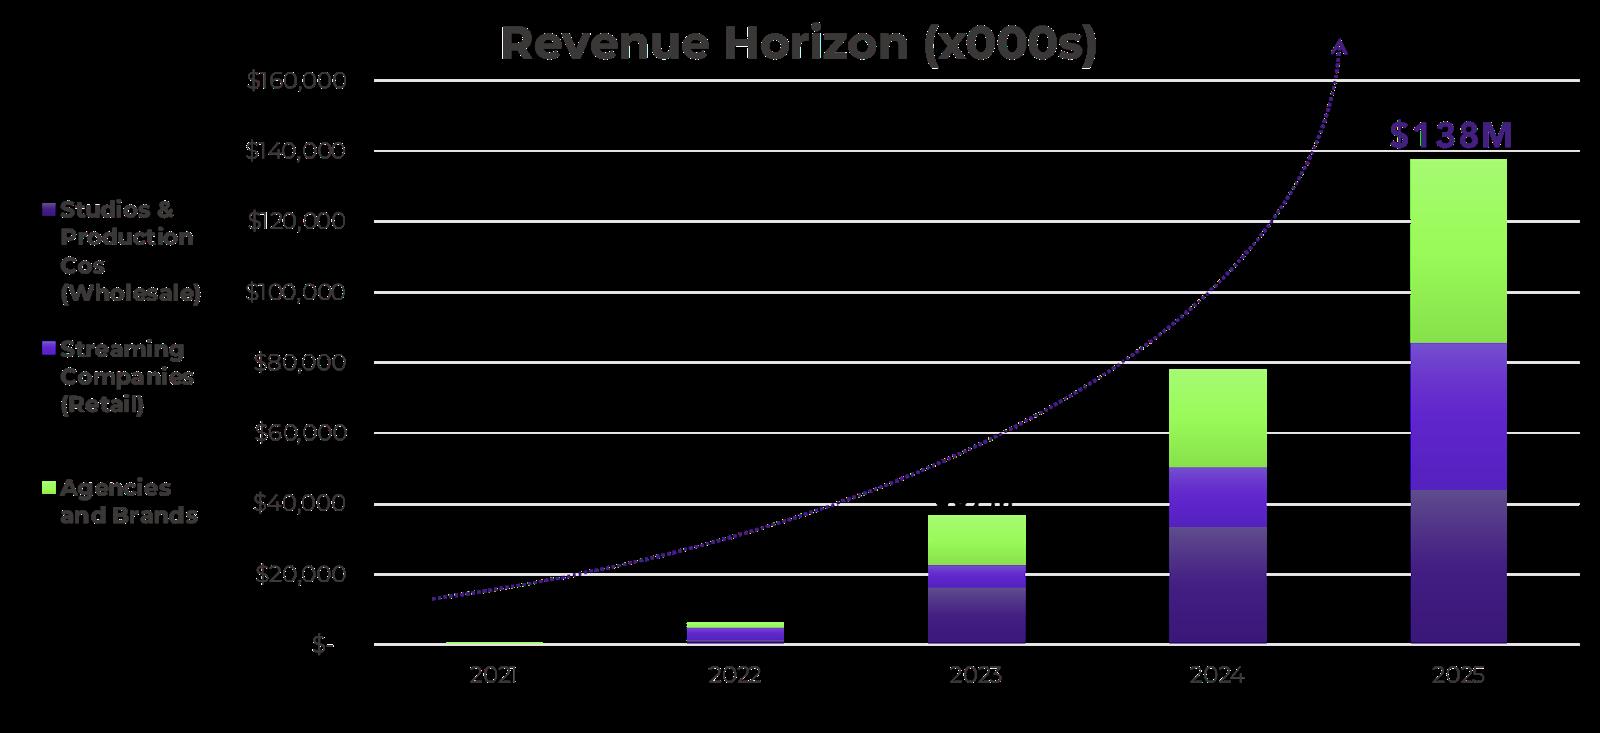 revenue-horizon